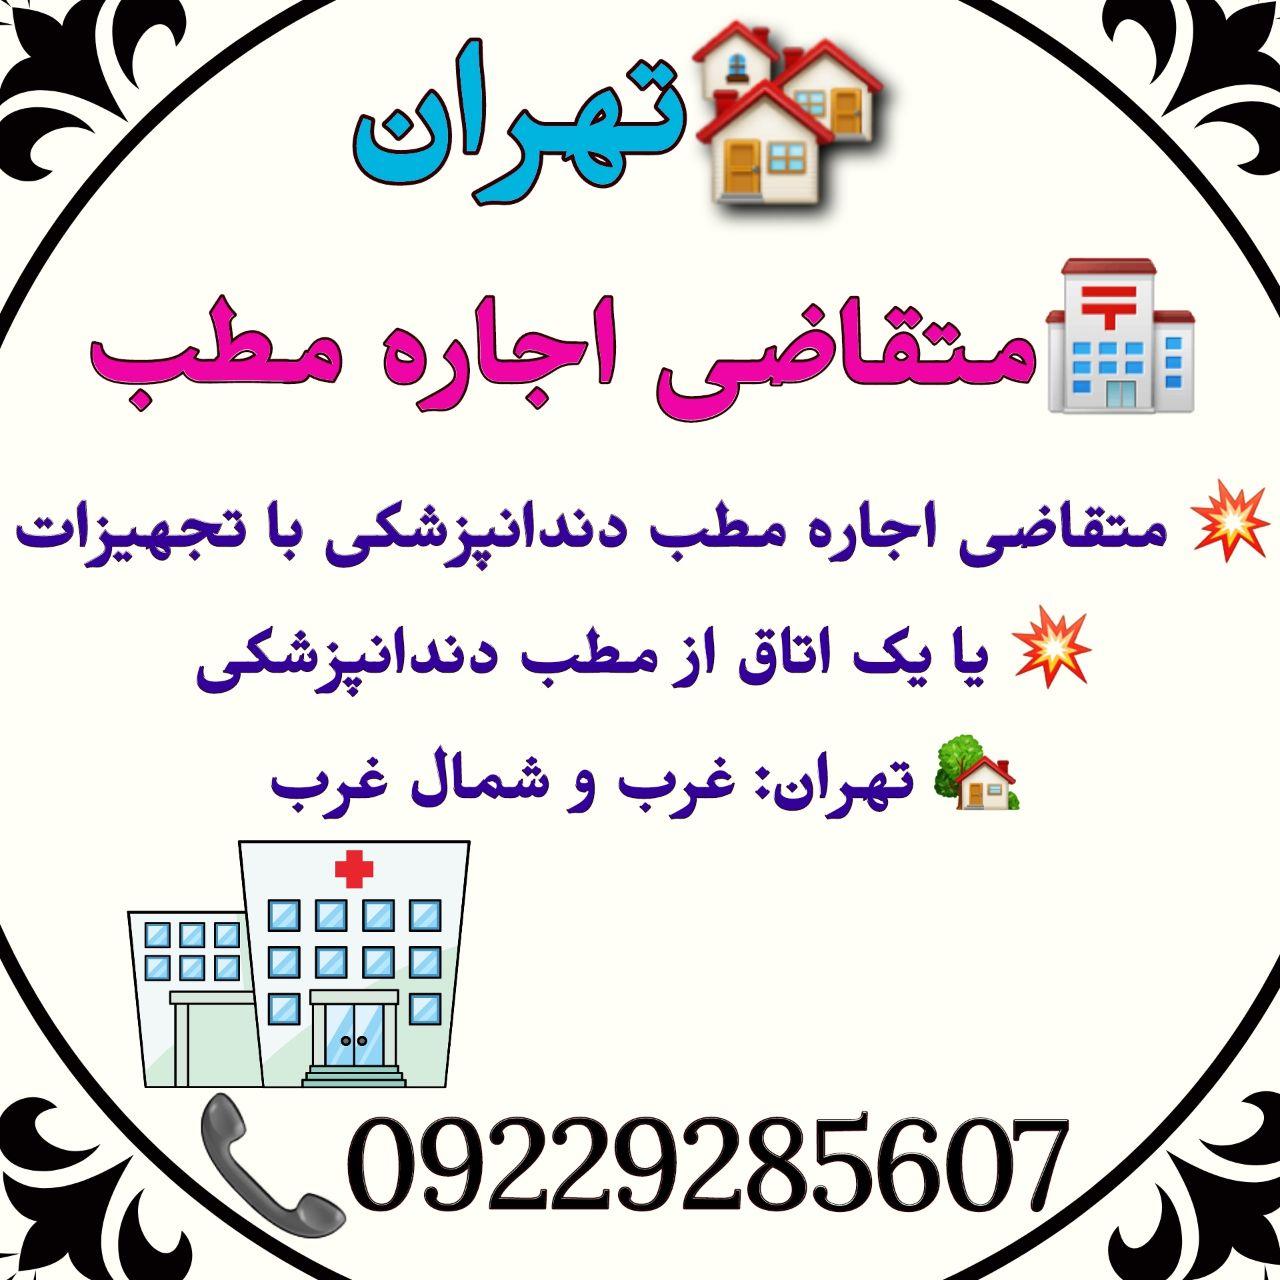 تهران: متقاضی اجاره مطب